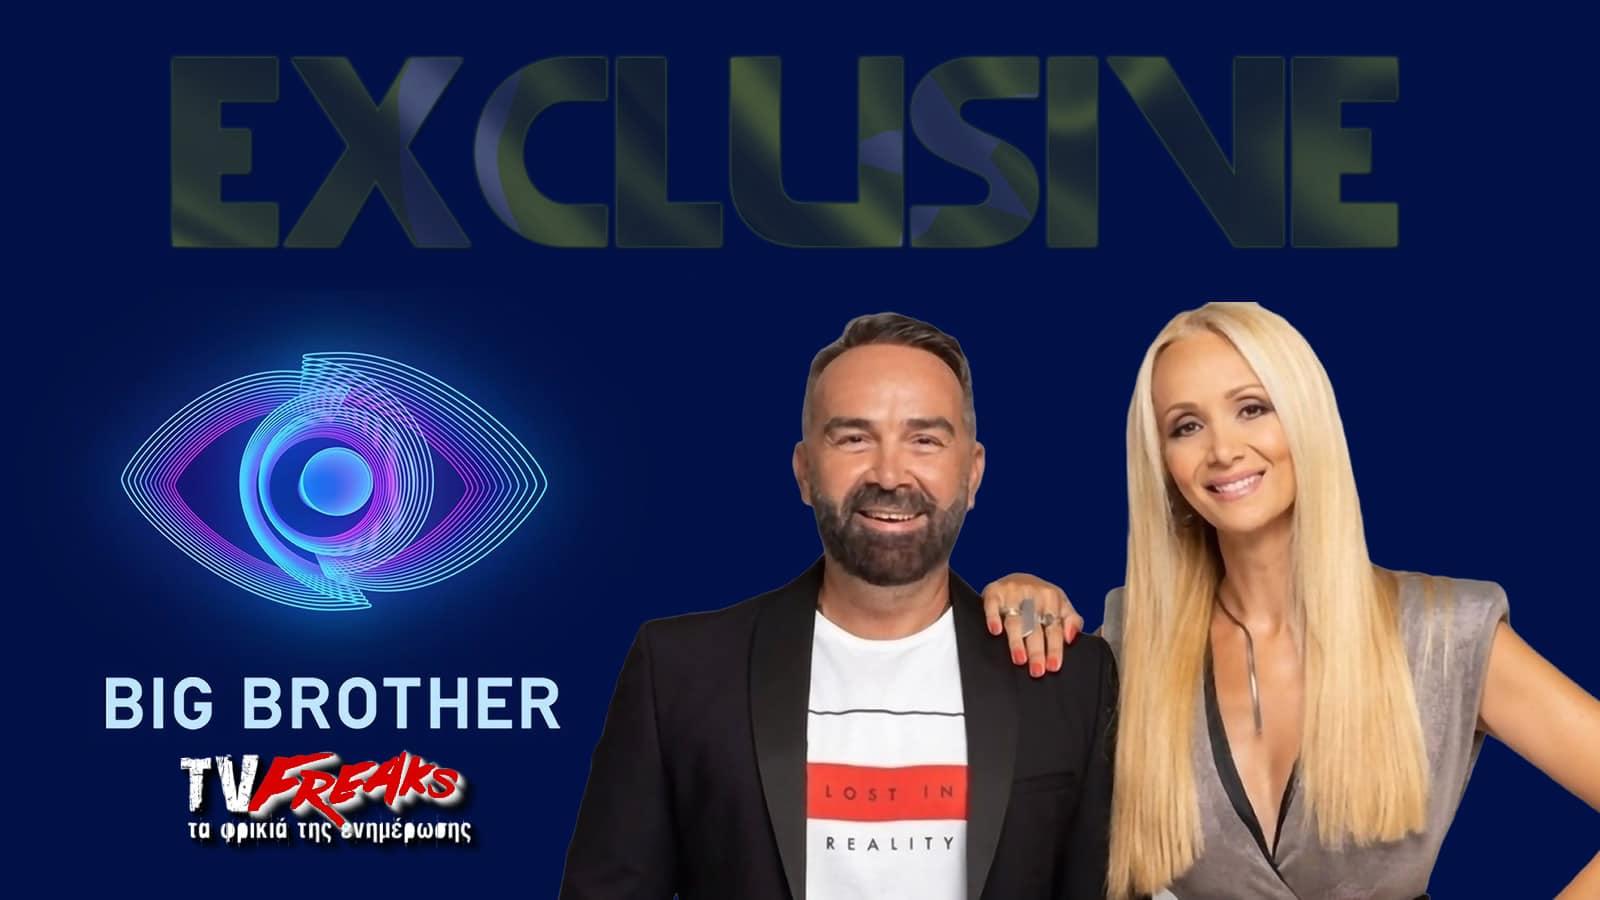 Big Brother spoiler: ΝΕΕΣ εξελίξεις με το ριάλιτι! Πότε κάνει πρεμιέρα και τι θα γίνει με το live streaming;